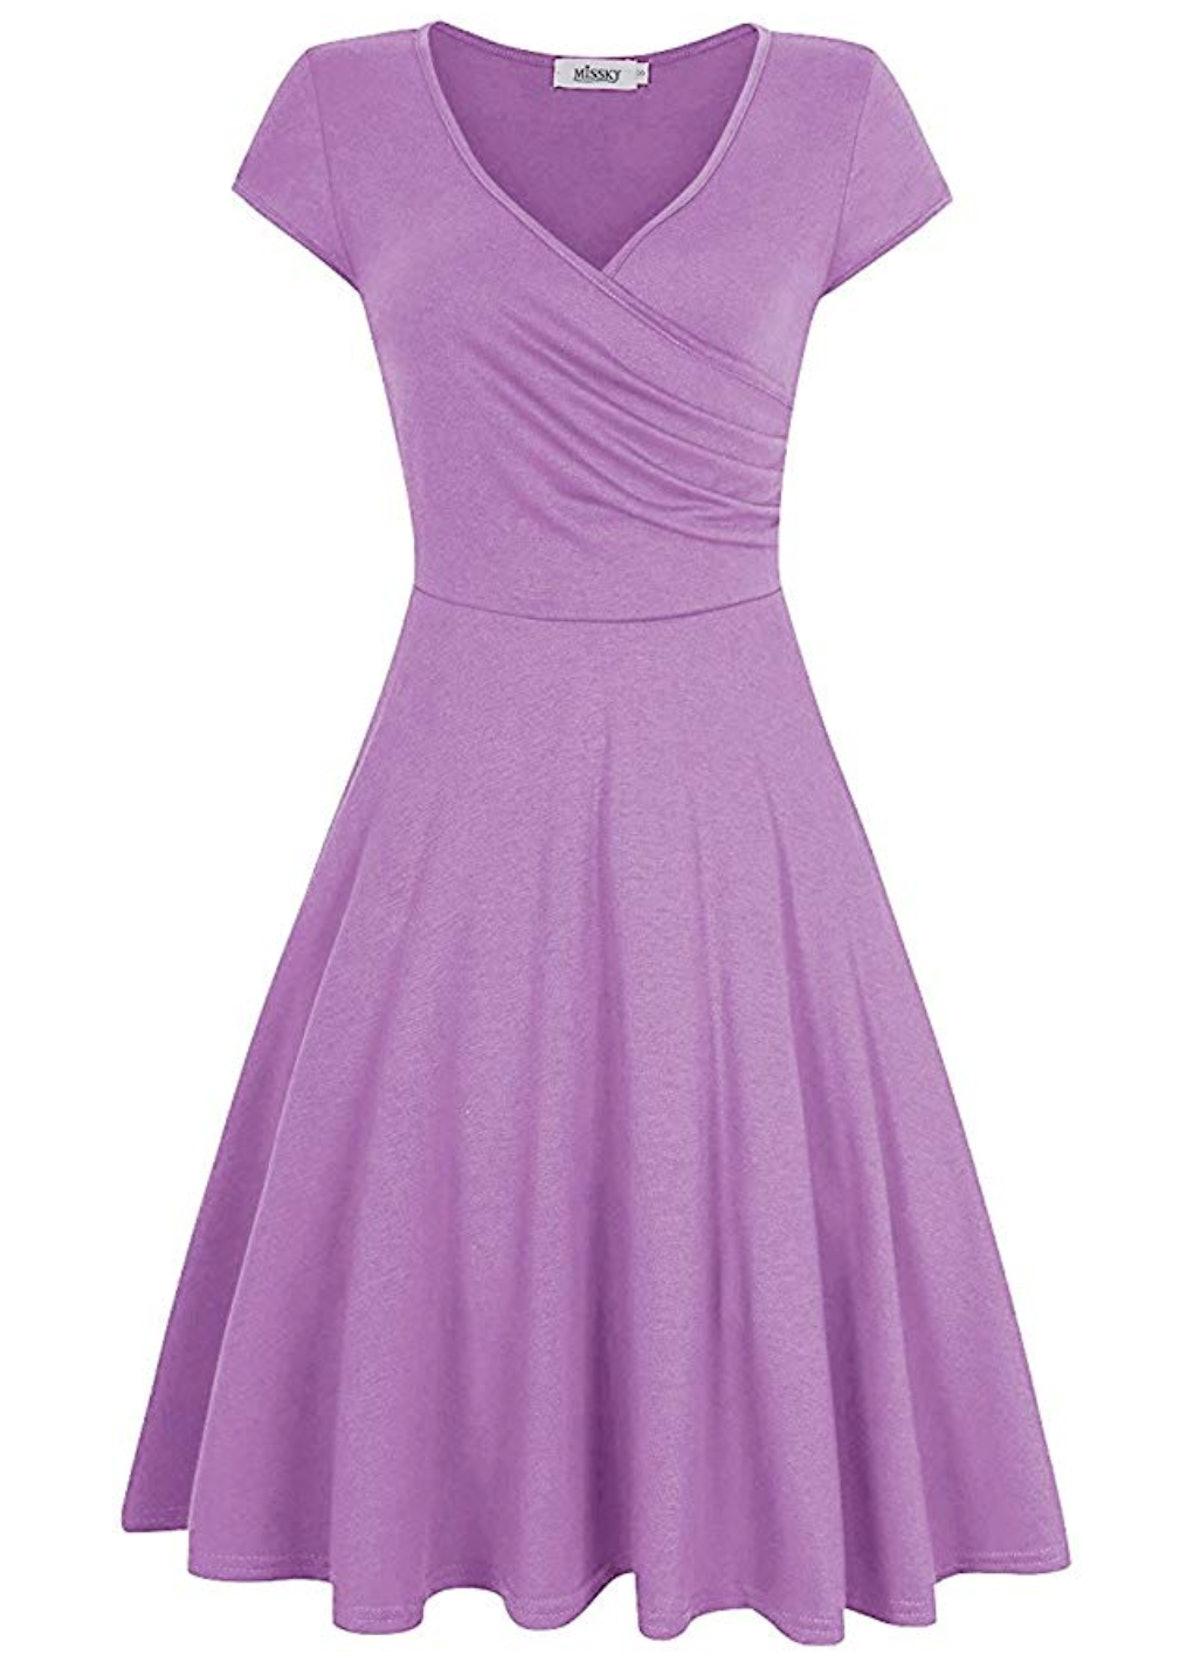 MISSKY Women's A Line V Neck Knee Length Swing Dress